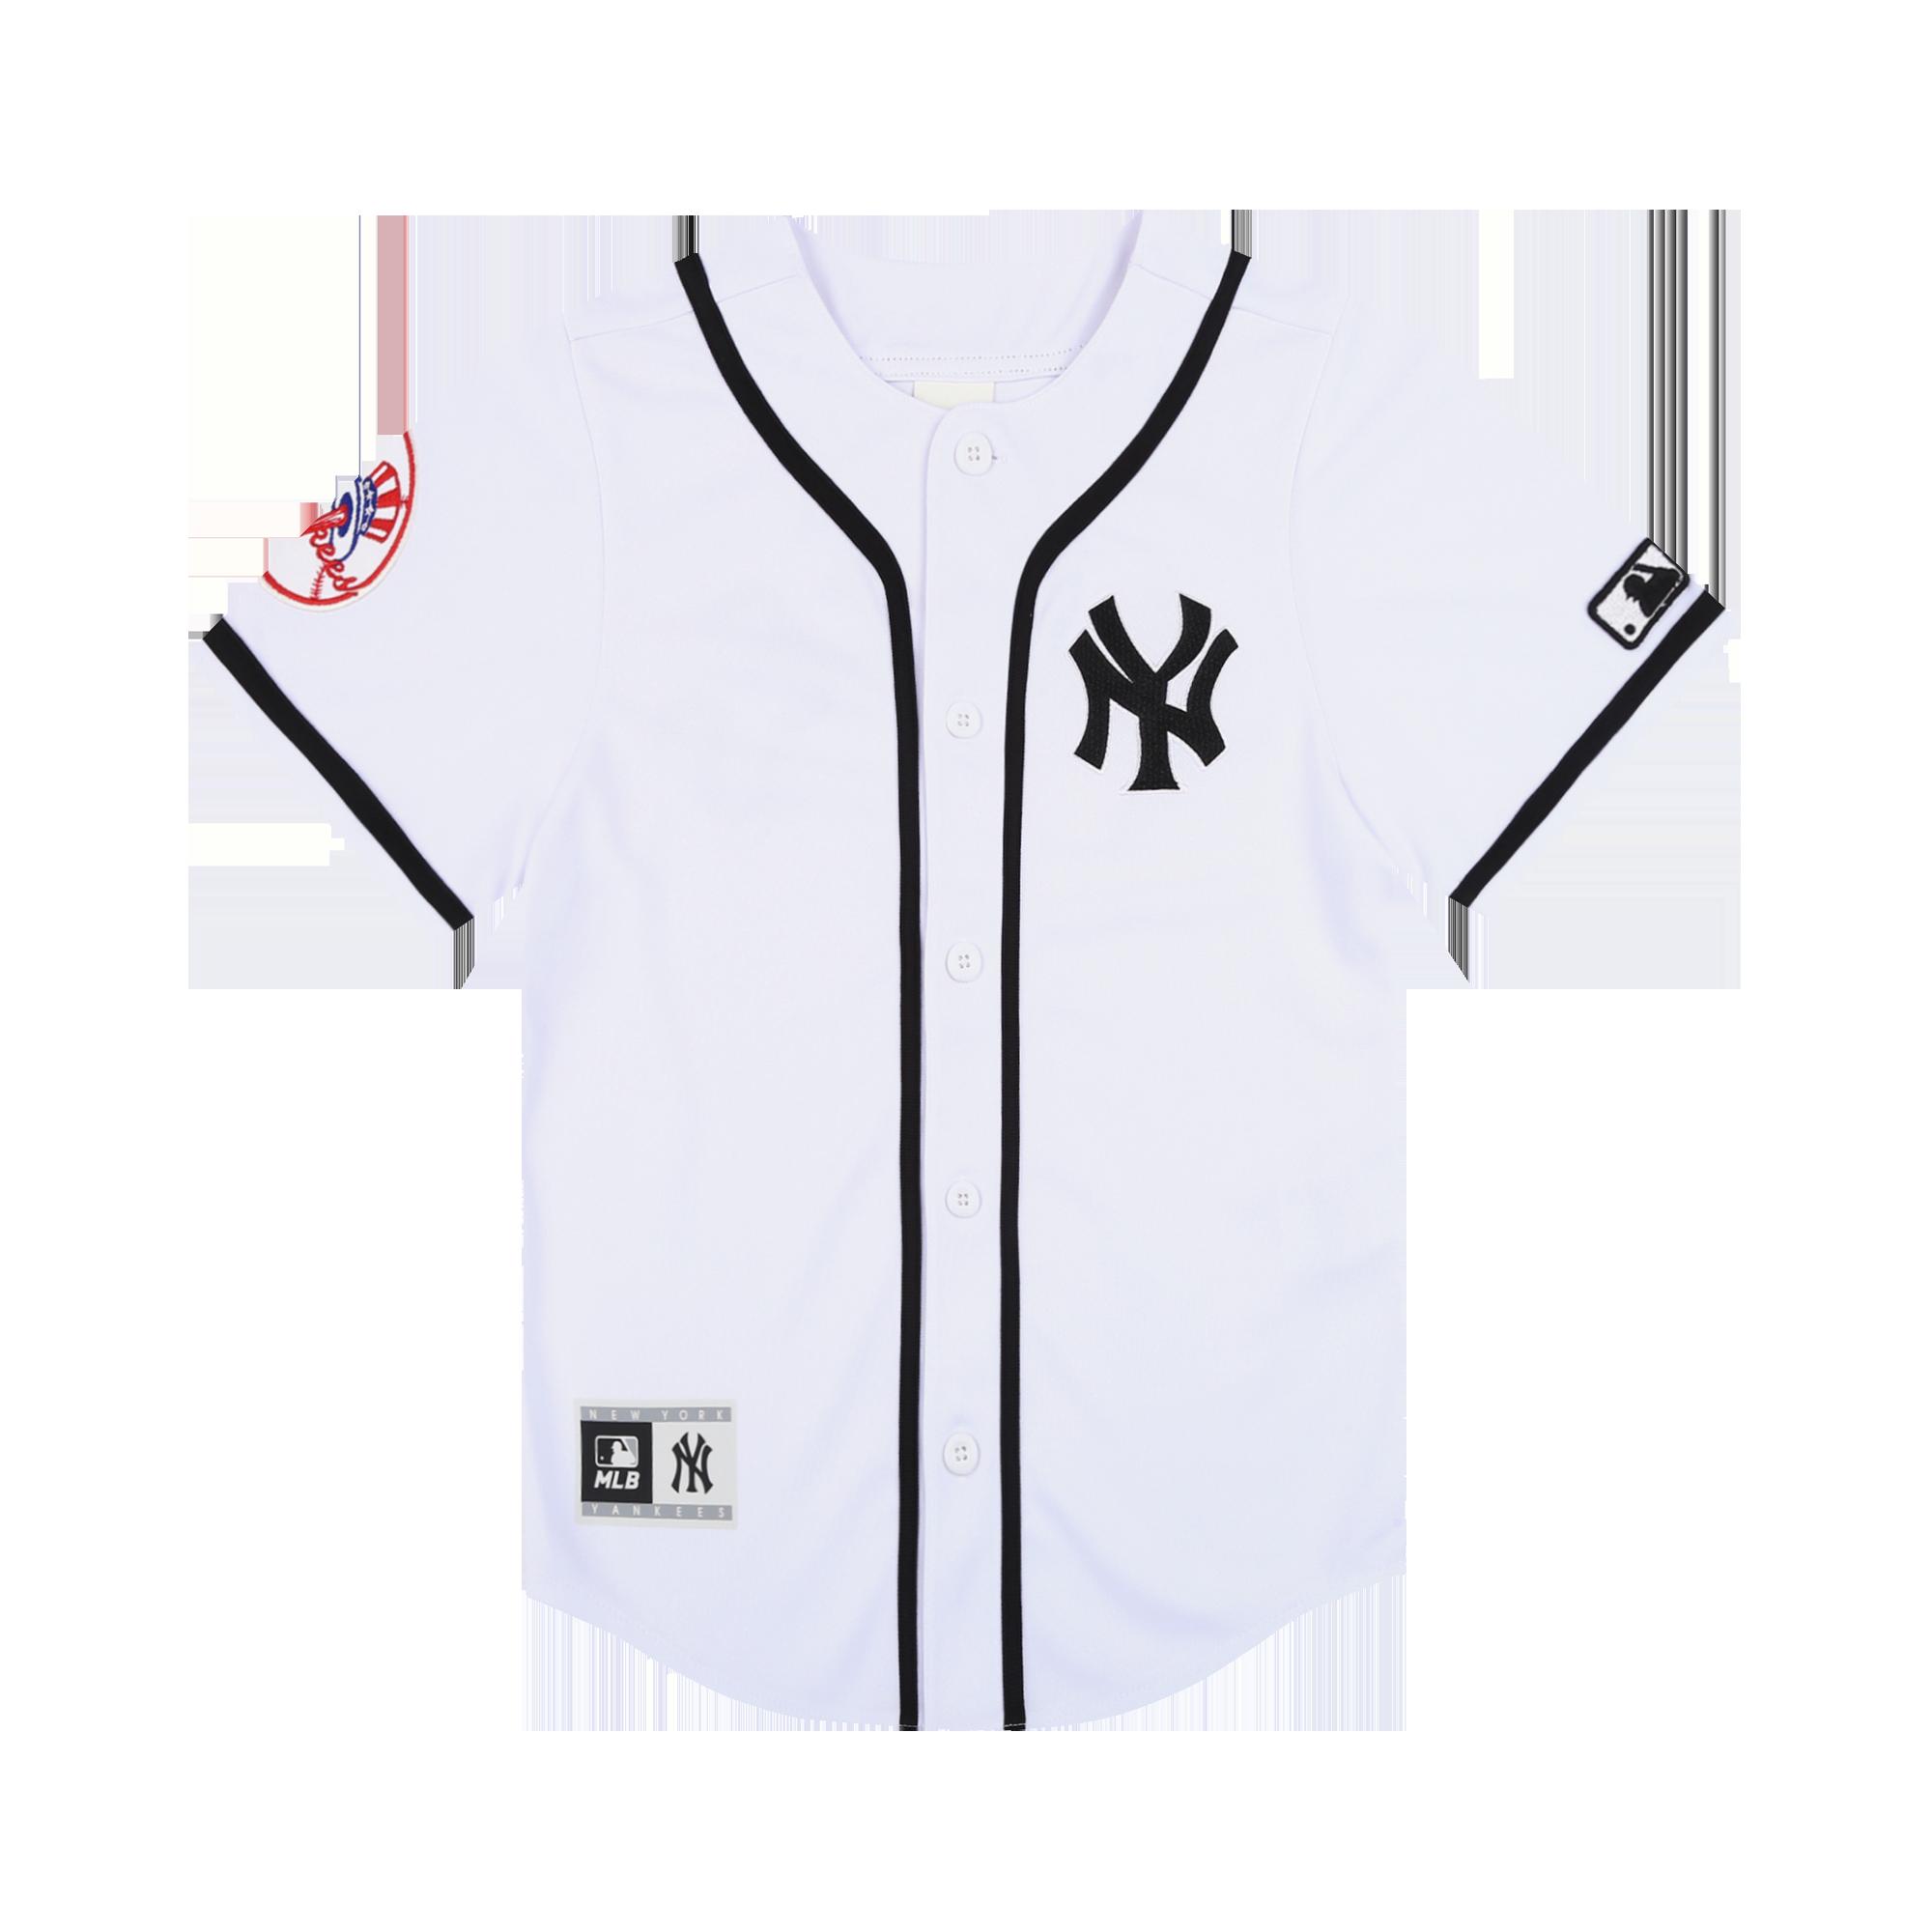 NEW YORK YANKEES UNISEX STREET BASEBALL JERSEY